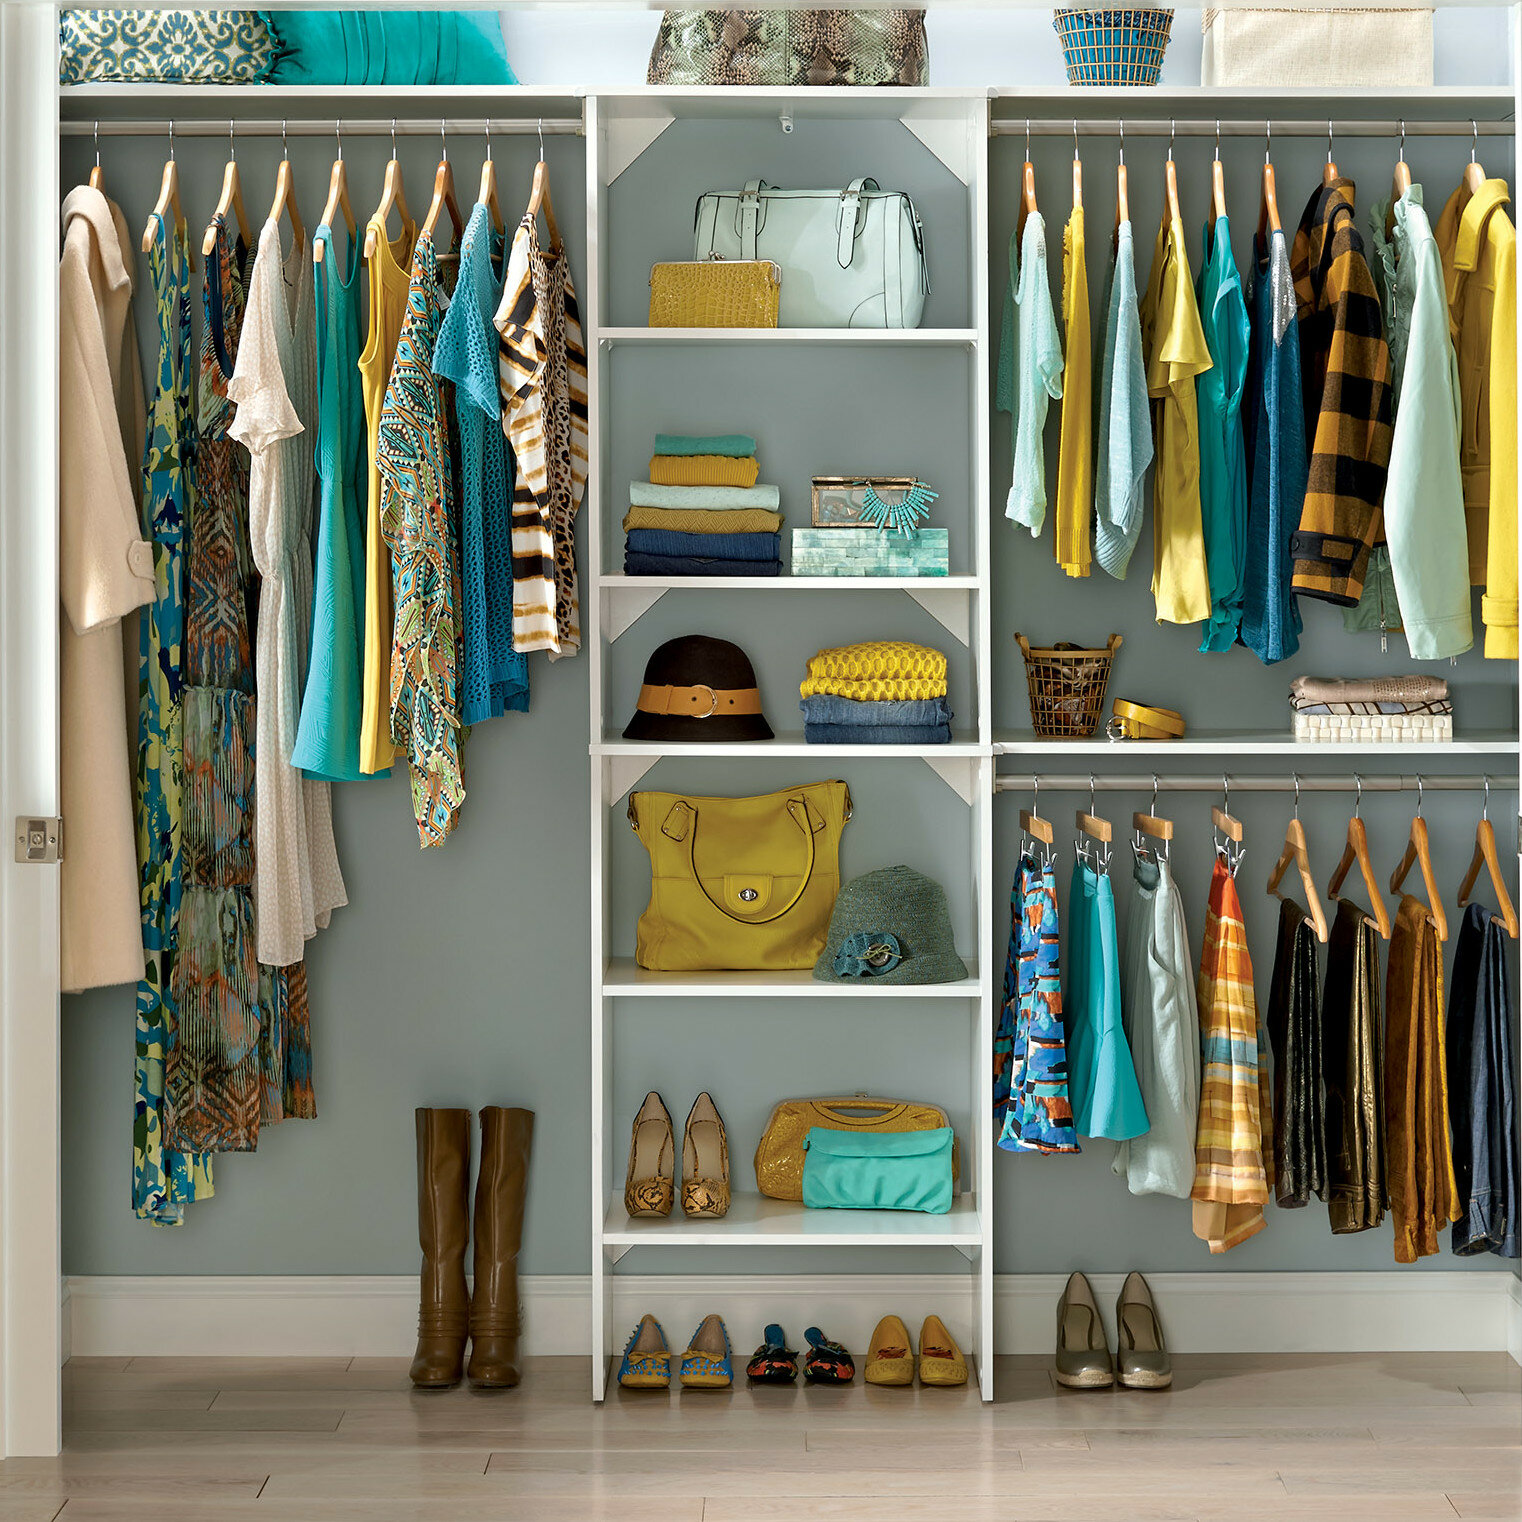 closetmaid suitesymphony 84 w 120 w closet system with top shelves reviews wayfair. Black Bedroom Furniture Sets. Home Design Ideas